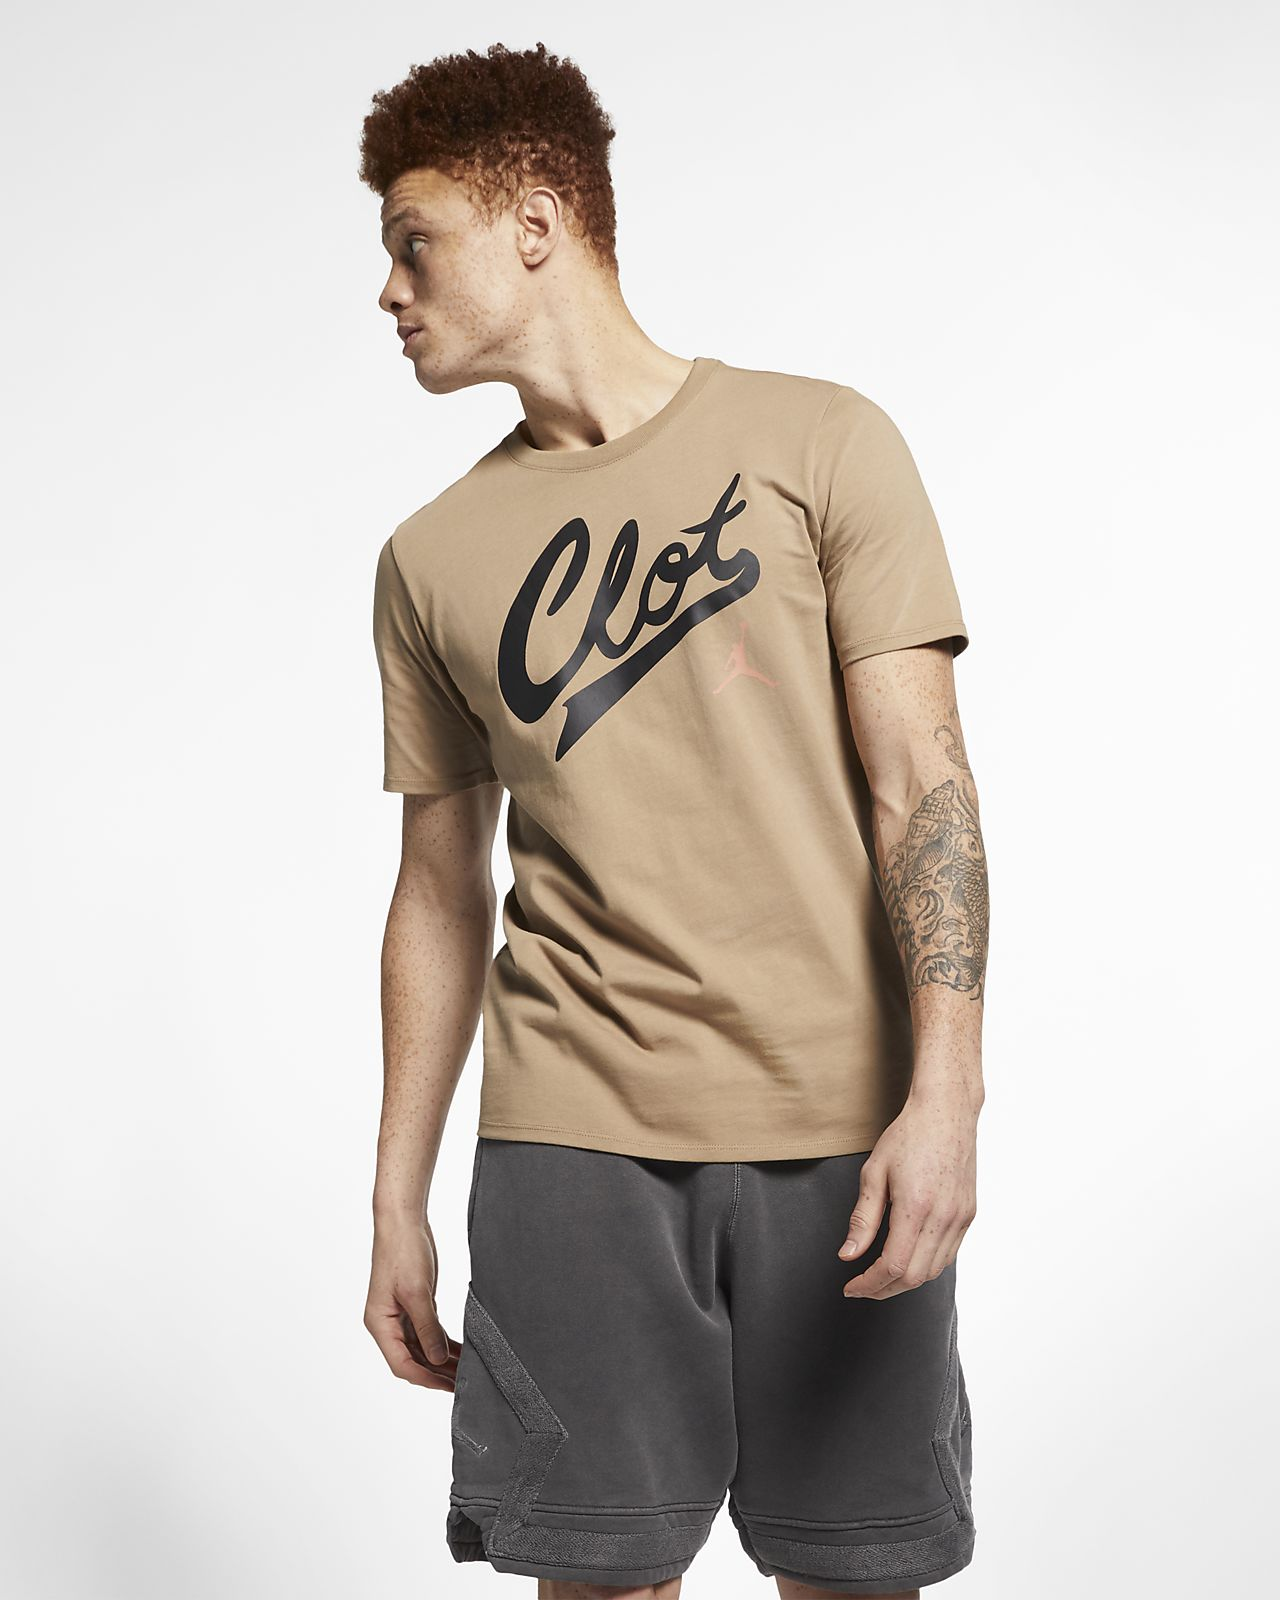 Jordan x CLOT 男子T恤